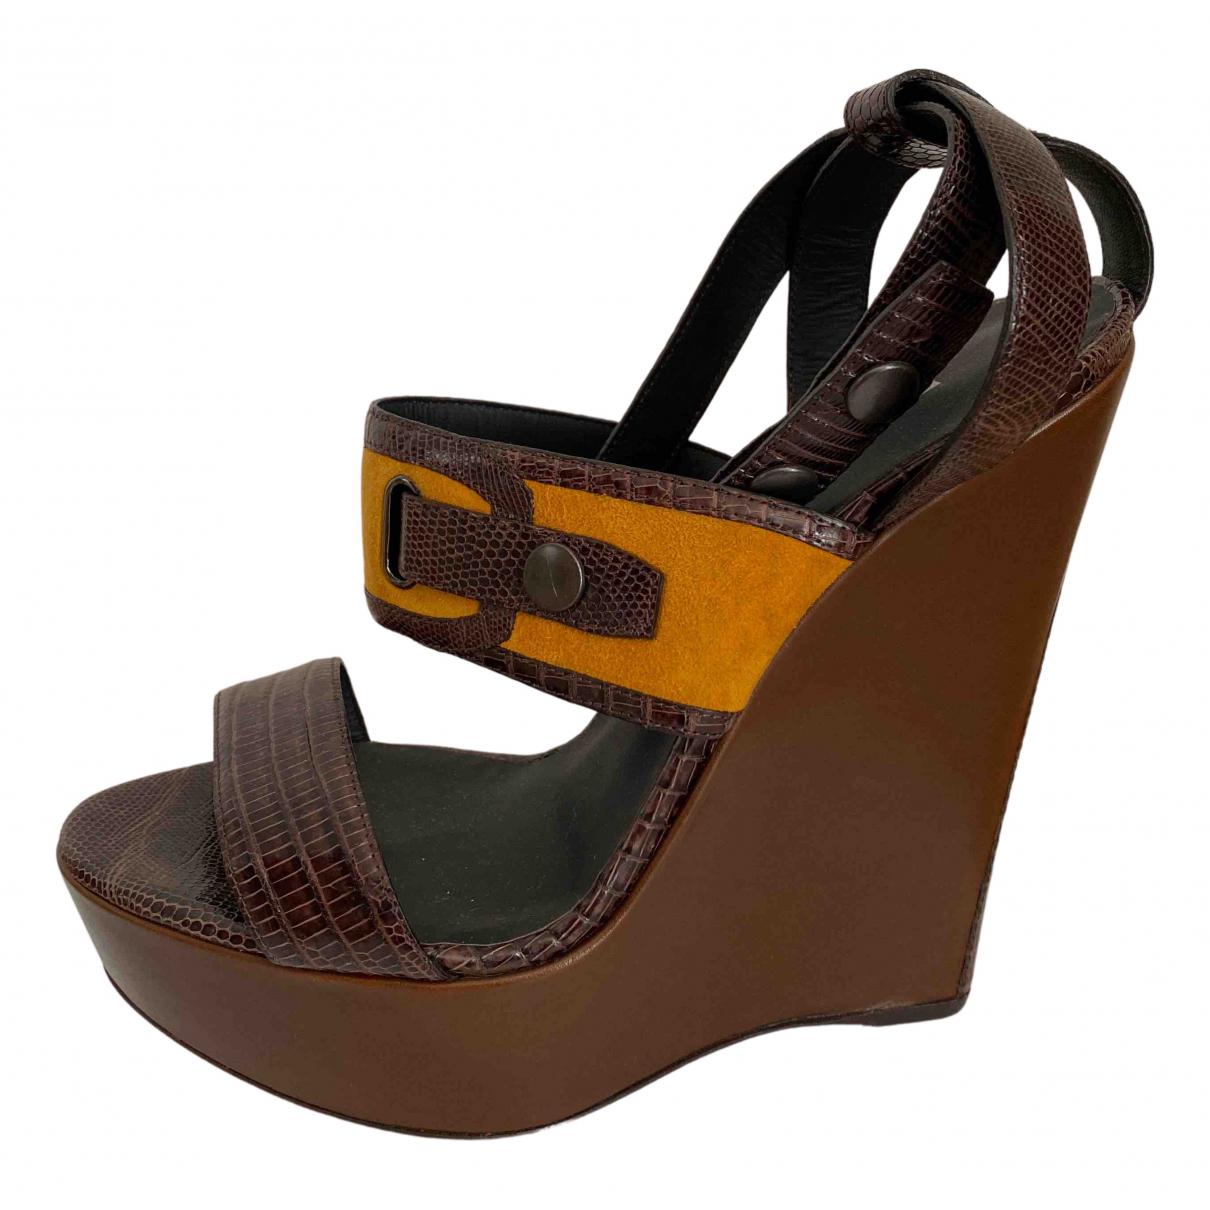 Belstaff N Brown Water snake Heels for Women 37.5 EU